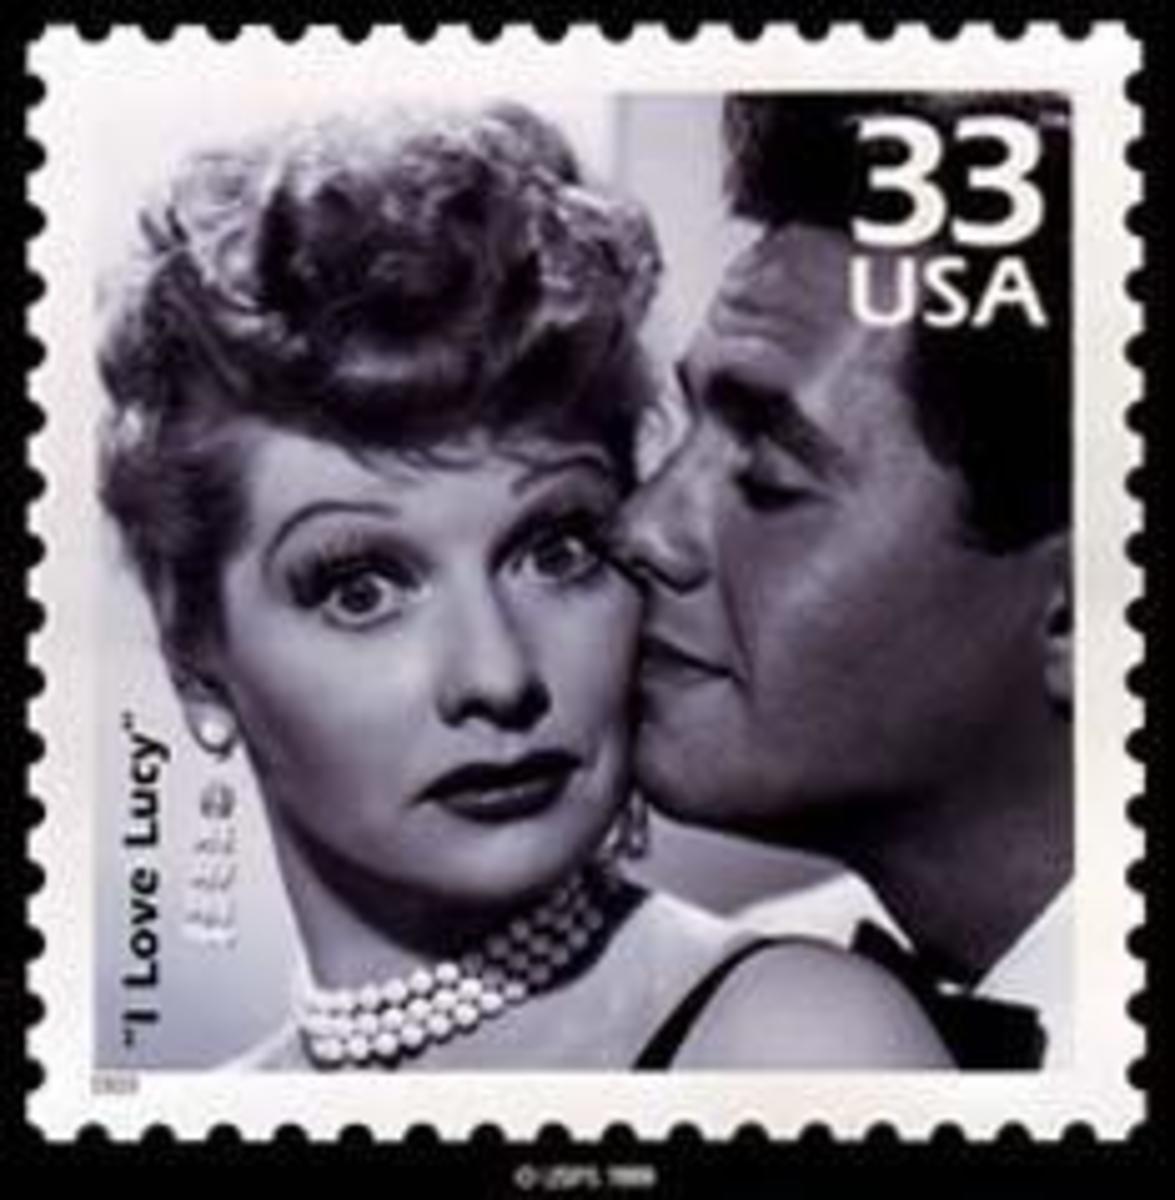 I Love Lucy - Lucille Ball - Desi Arnaz